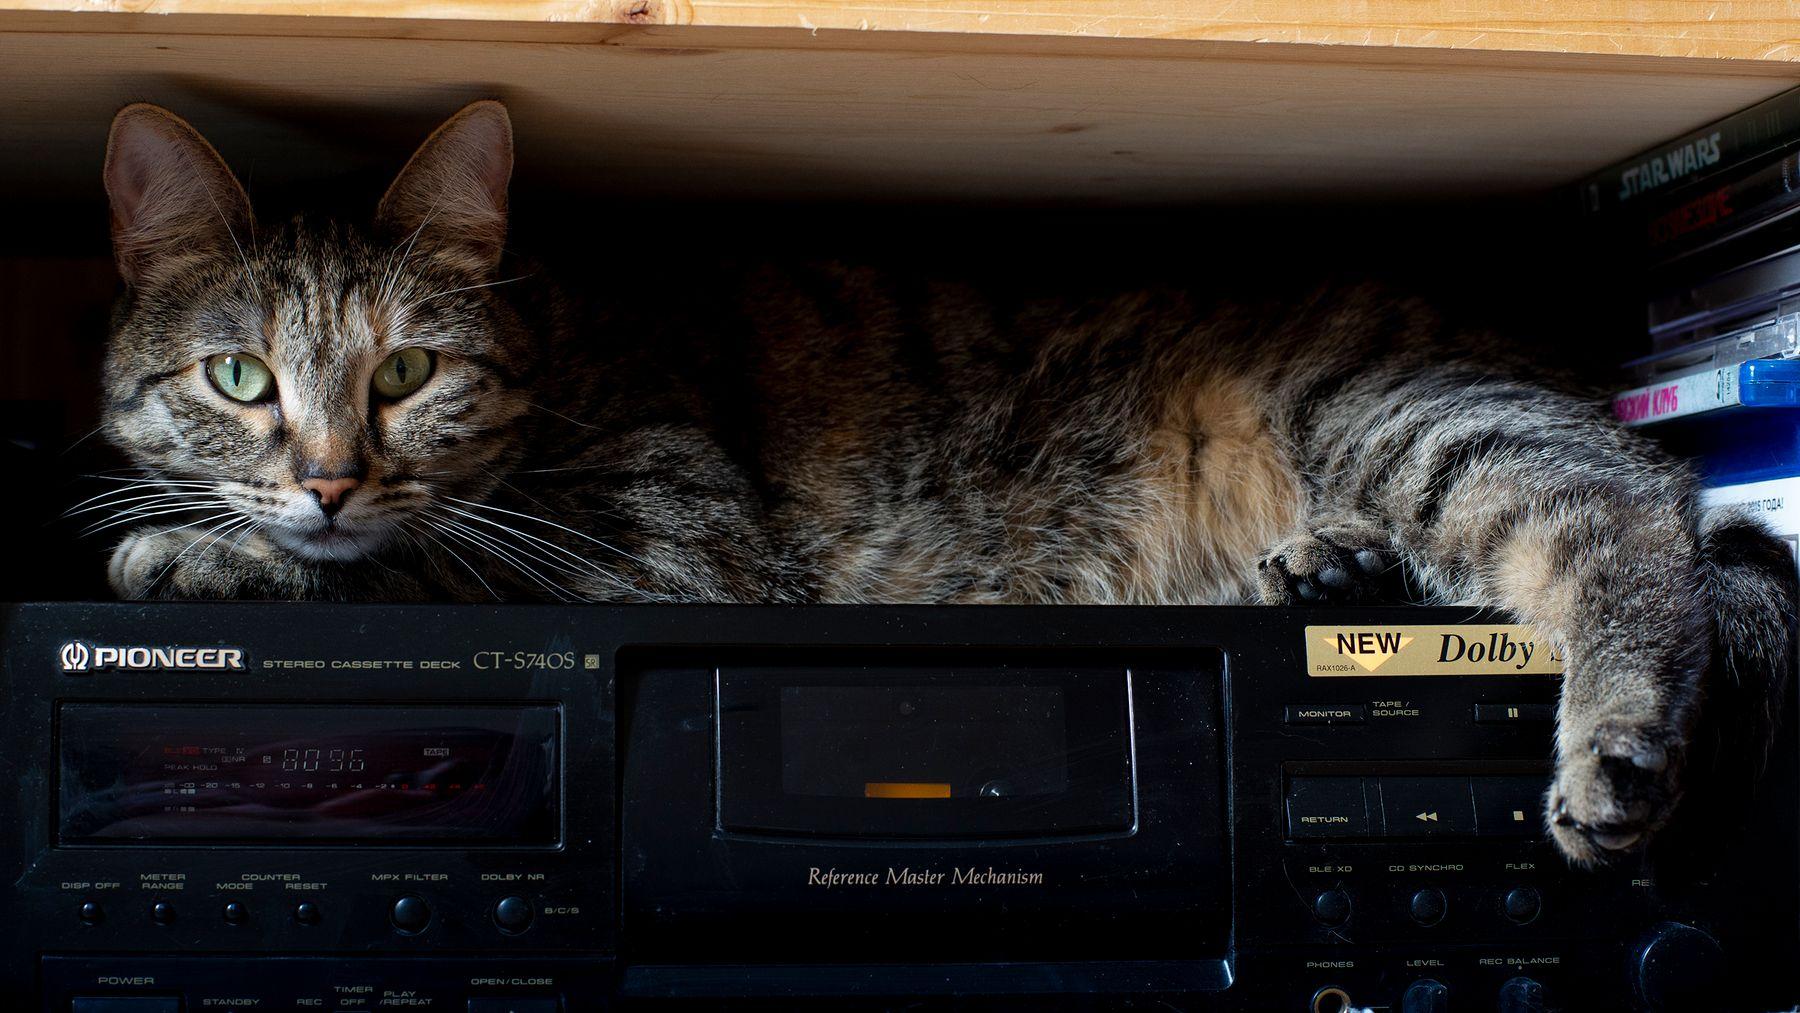 Кошка старого меломана кошка кот усы нос кассетник